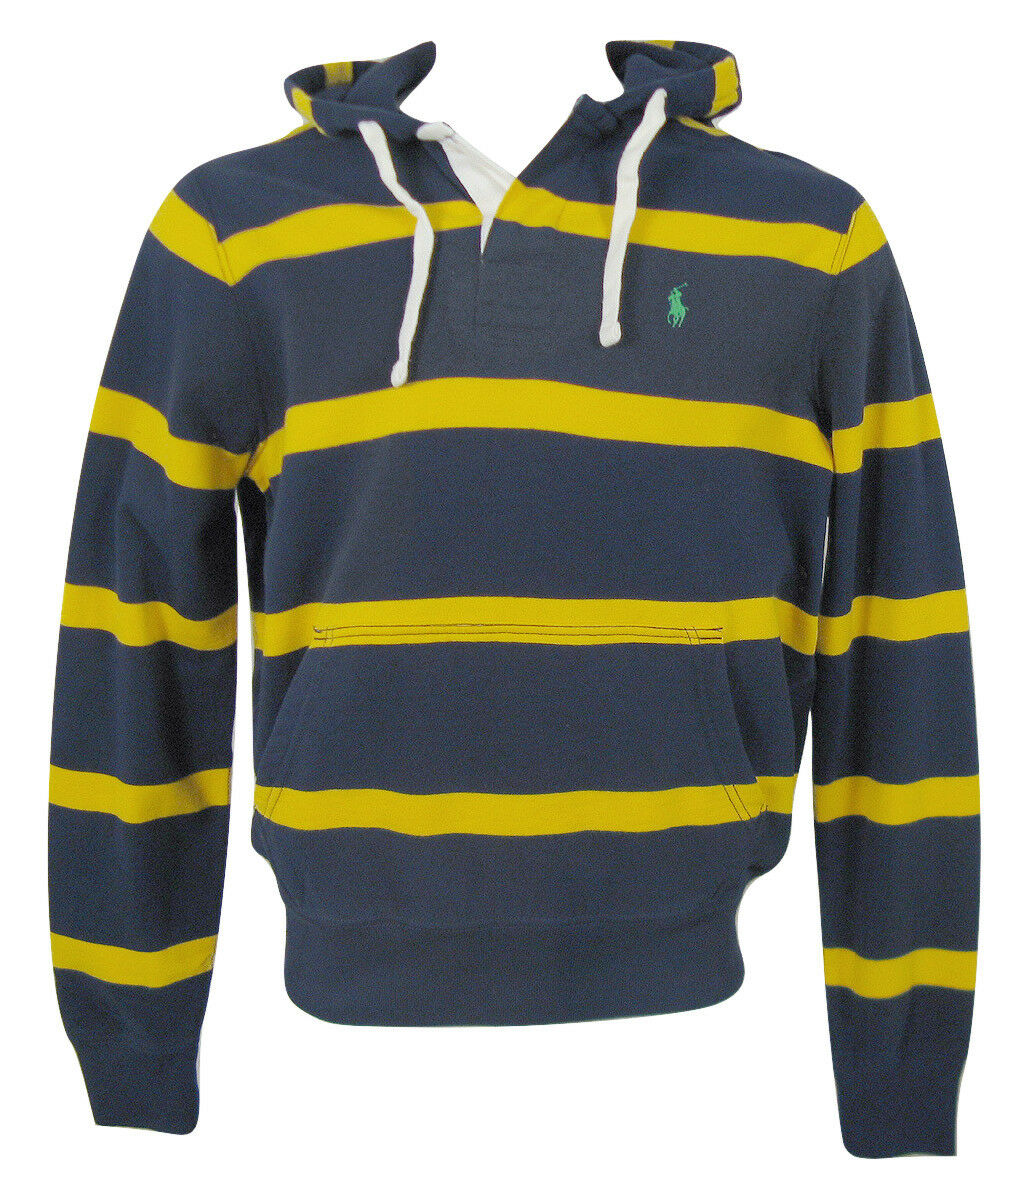 NEW Polo Ralph Lauren Rugby Style Hoodie Sweatshirt   grau, Navy, Grün or ROT